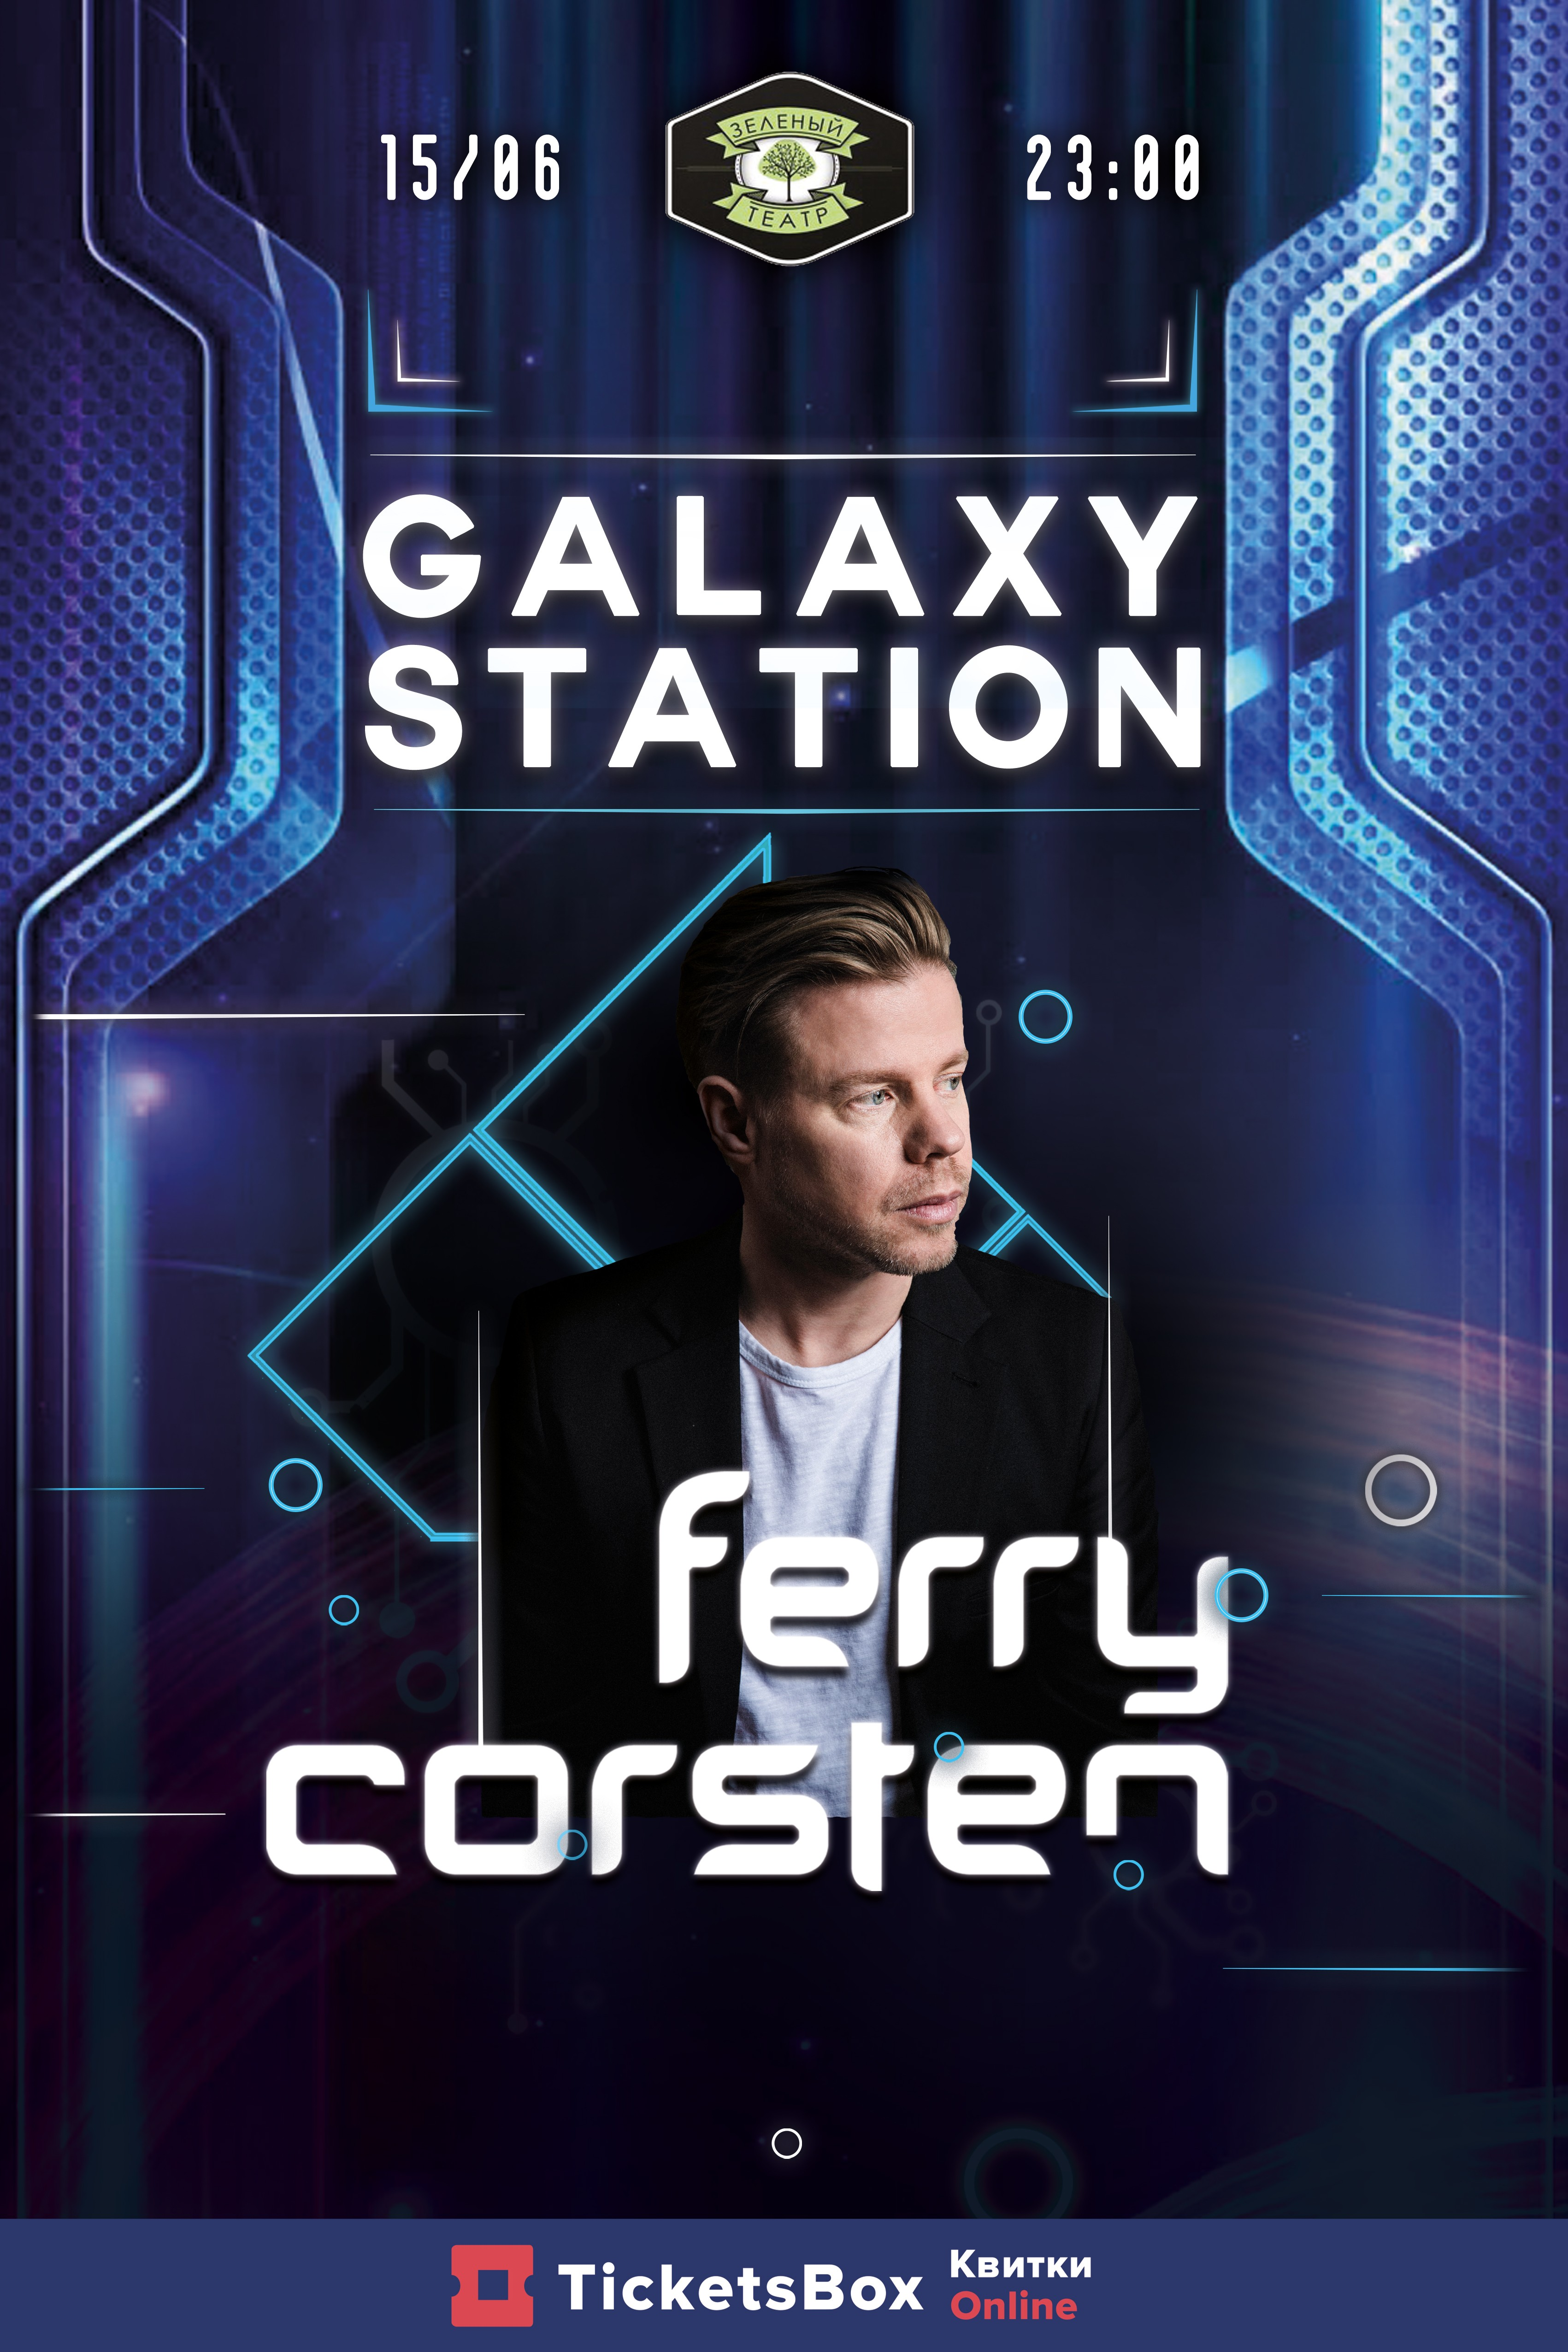 Билеты Galaxy Station. Ferry Corsten, Andy Moor, Super8 & Tab